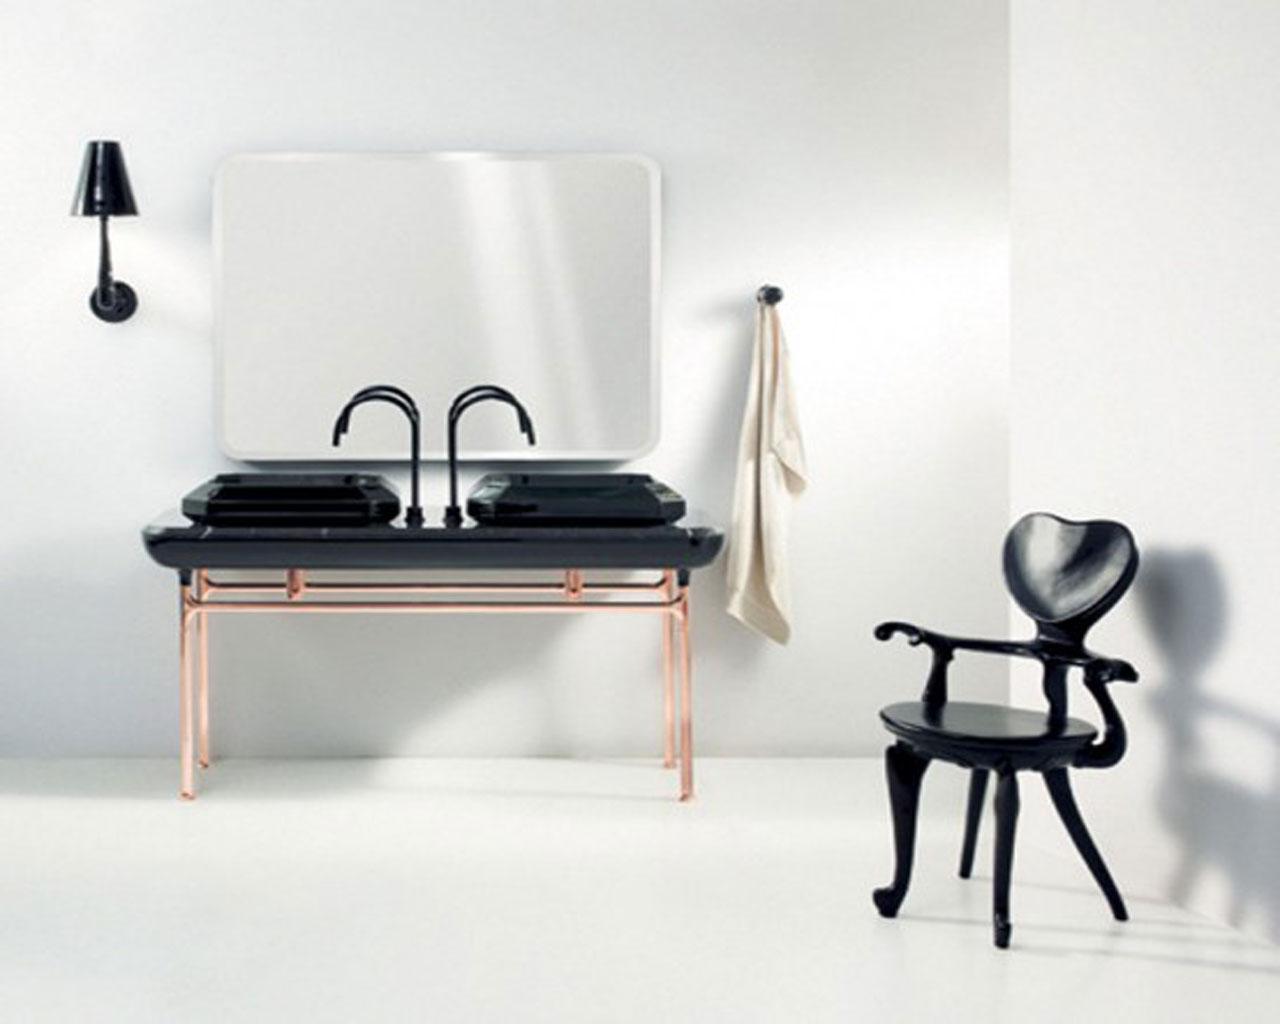 art-deco-bathroom-design-hot-style-design-1280x1024